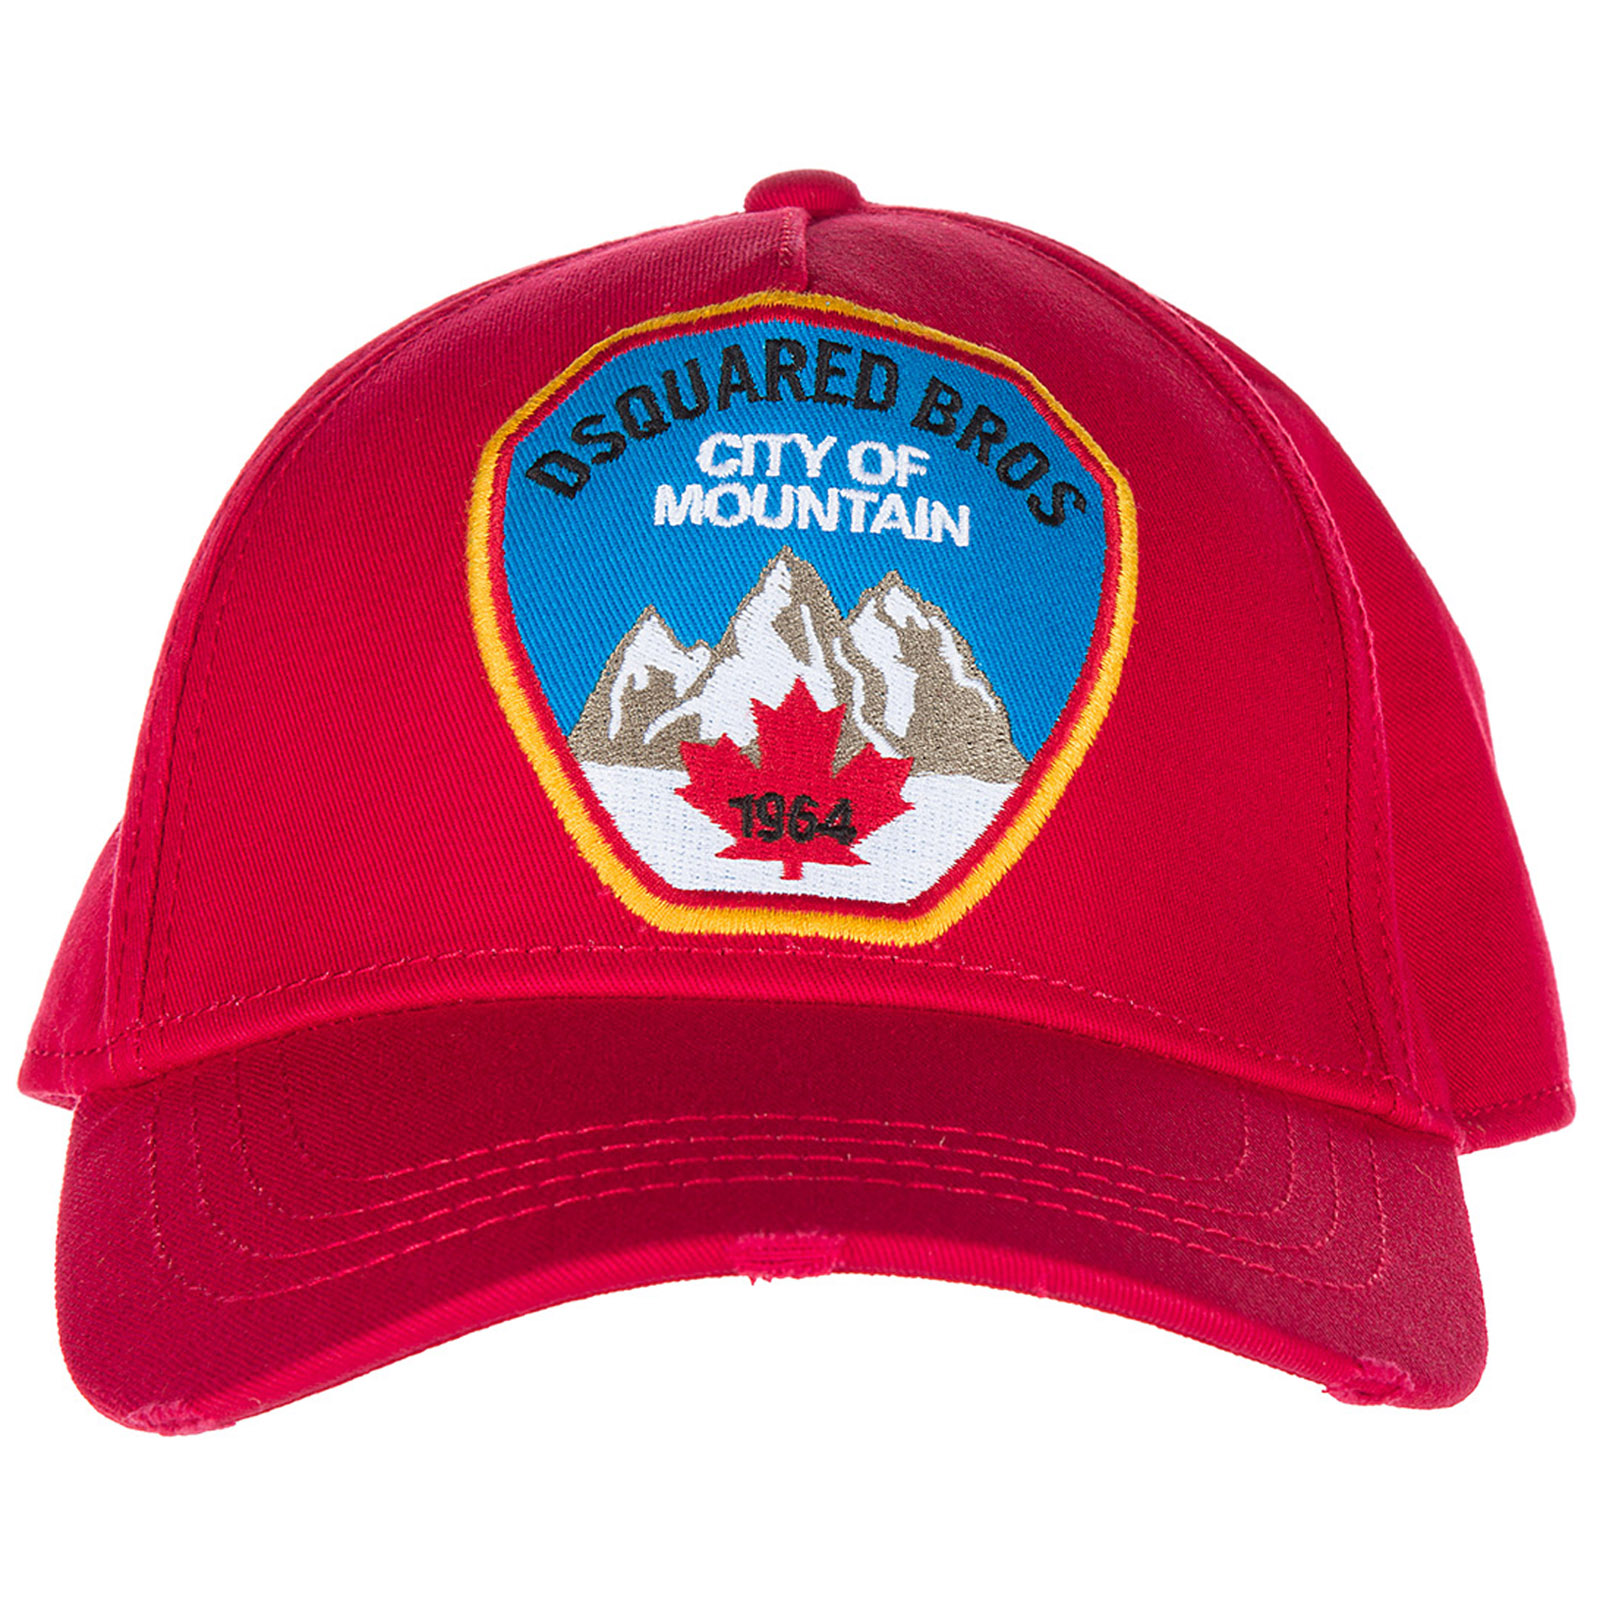 a492306860a ... Adjustable men s cotton hat baseball cap gabardine ...